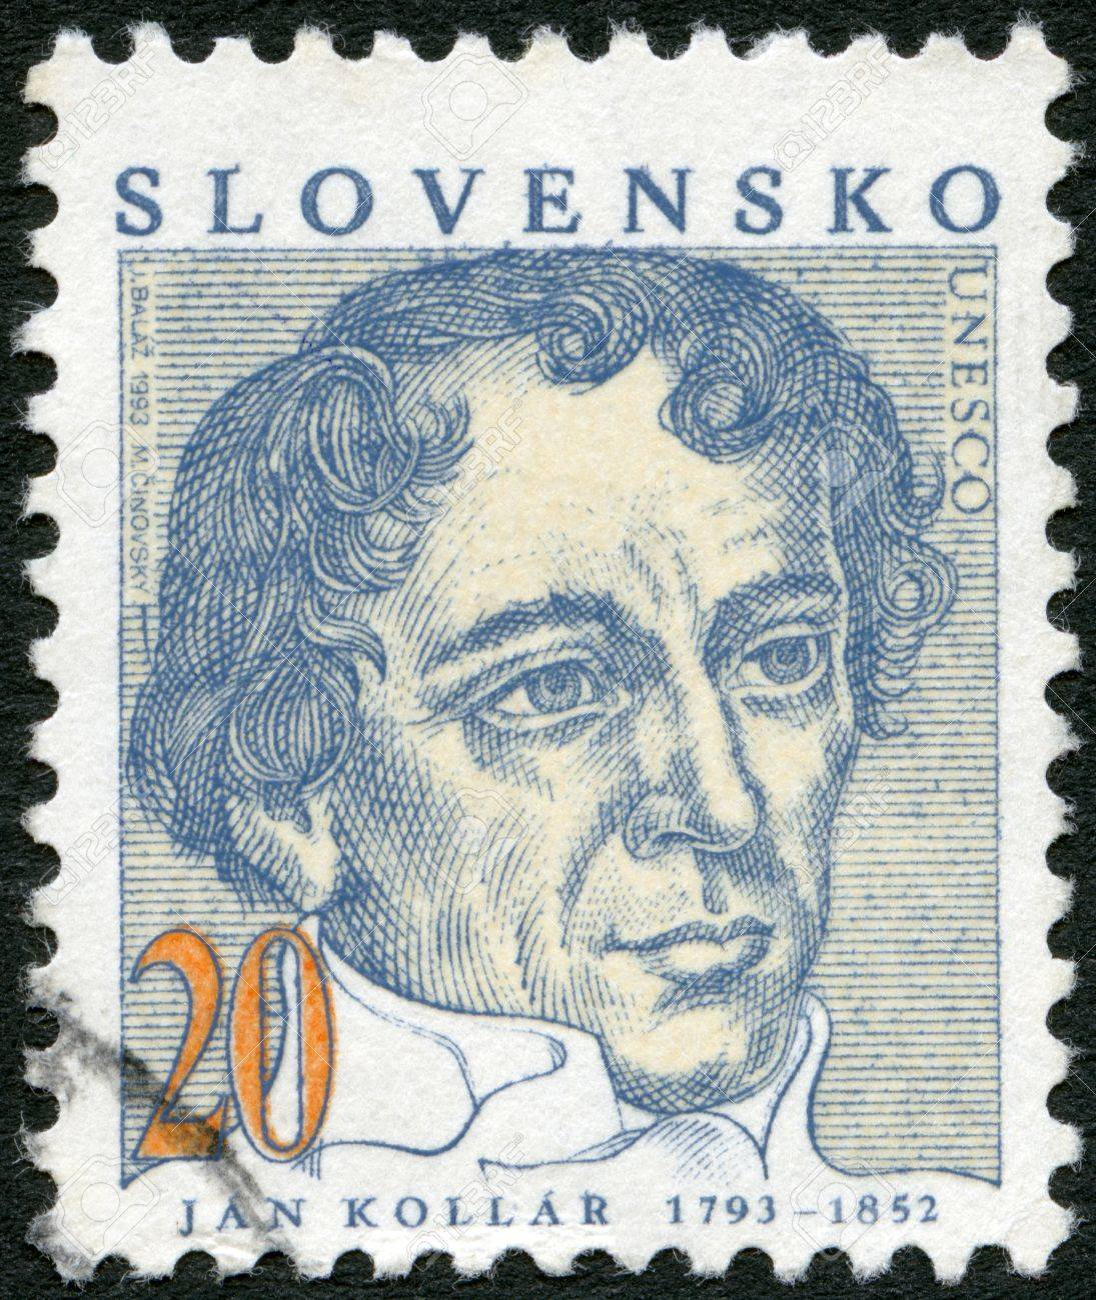 SLOVAKIA - CIRCA 1993  A stamp printed in Slovakia shows Jan Kollar  1793-1852 , writer, circa 1993 Stock Photo - 15724092